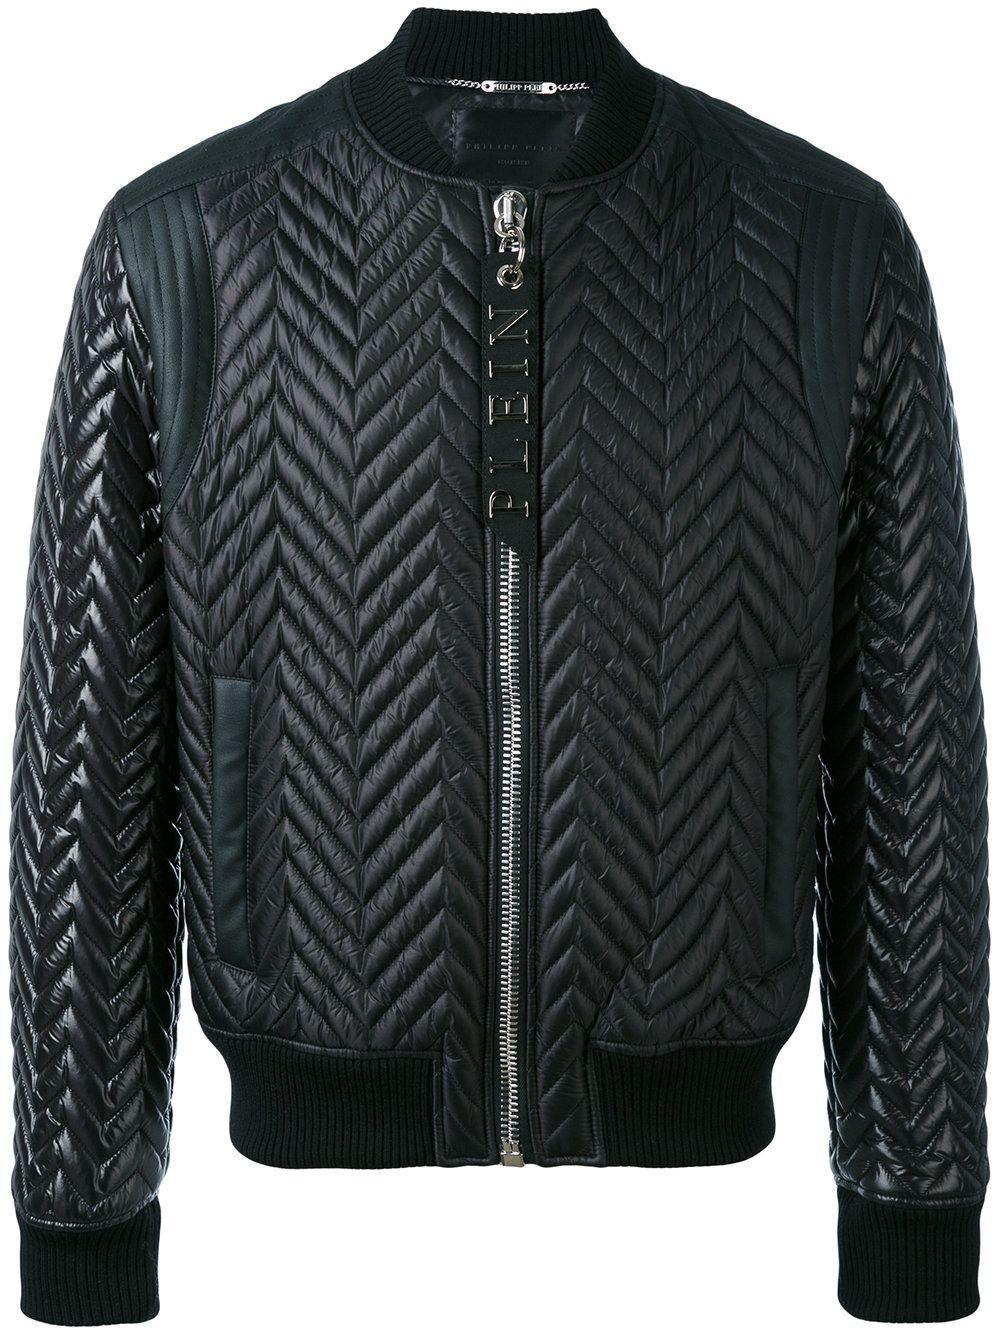 Wholesale Replica Philipp Plein New Jackets, Fake Jackets